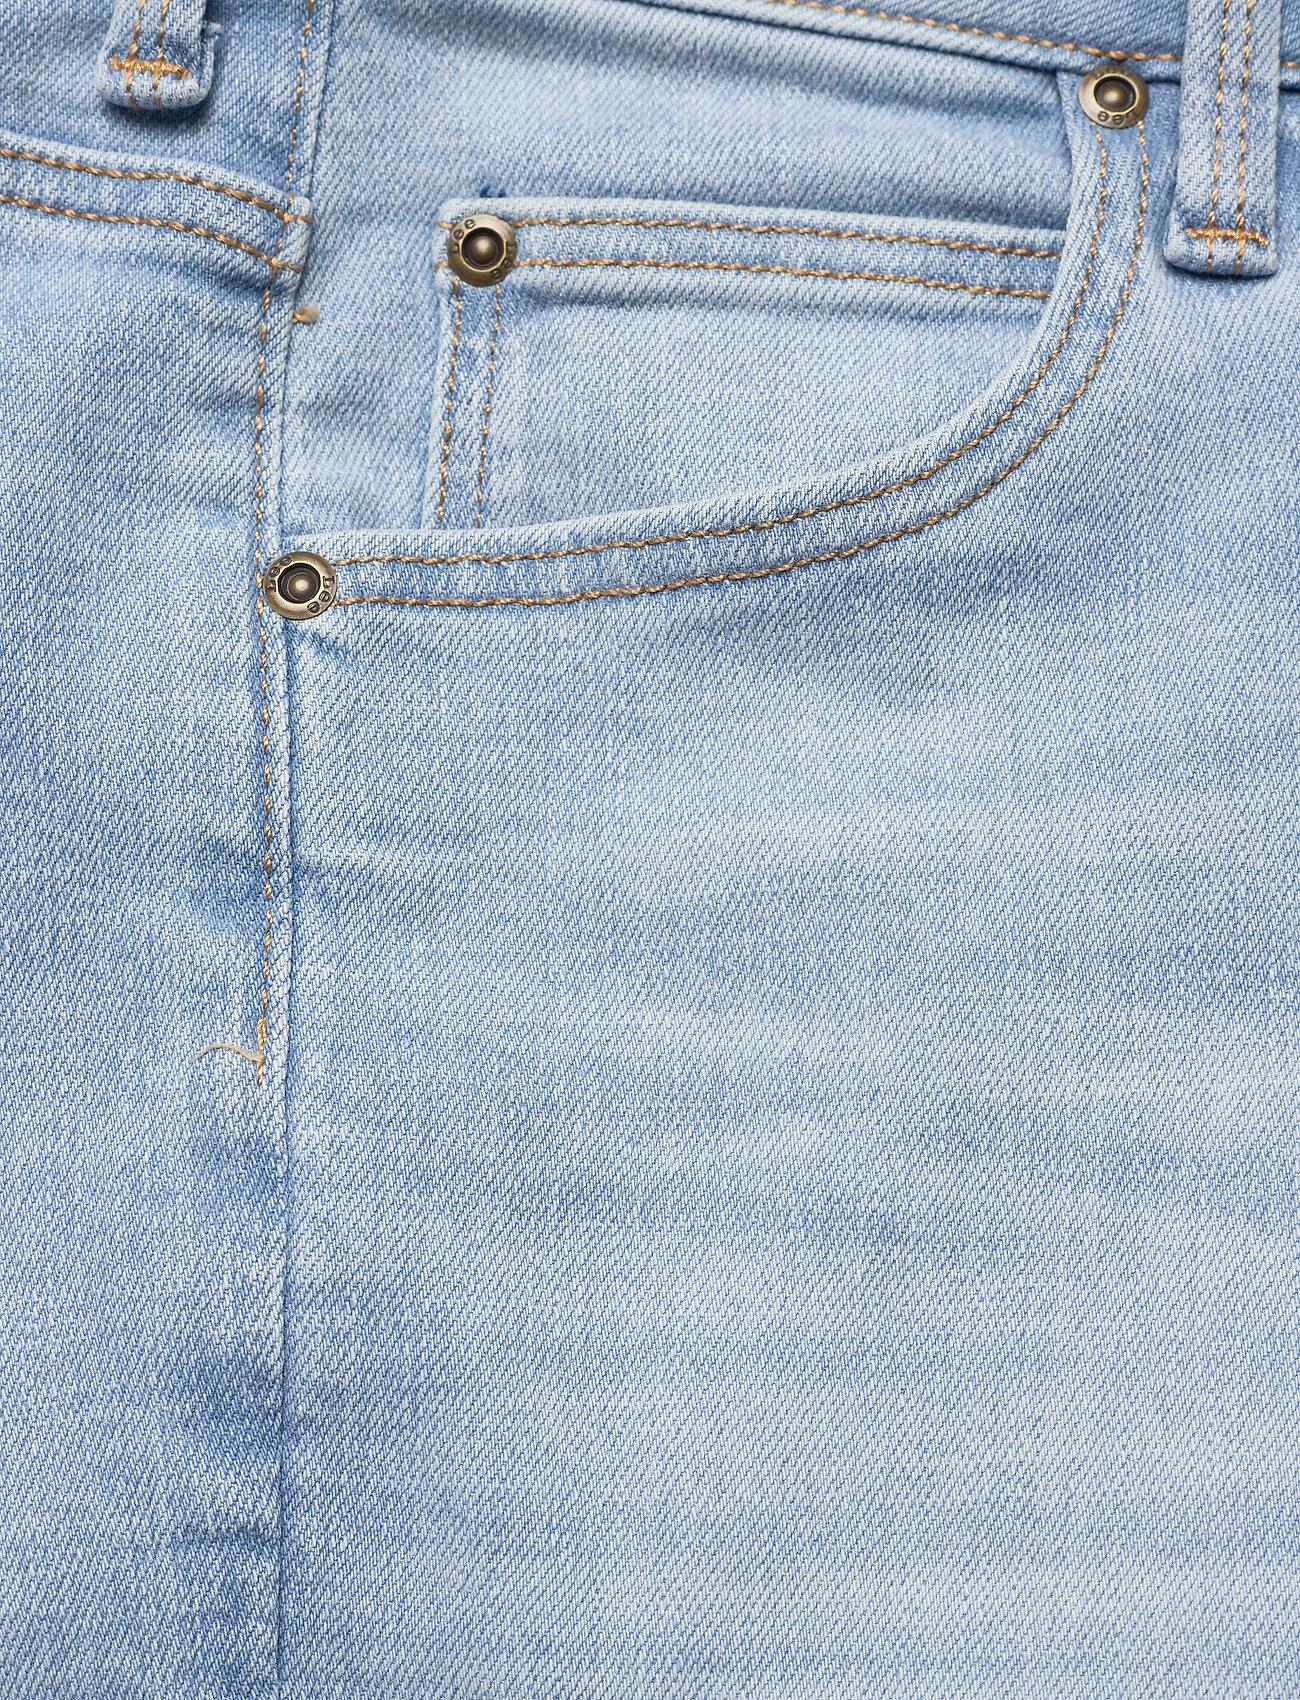 Lee Jeans - SCARLETT HIGH - skinny jeans - bleached azur - 2